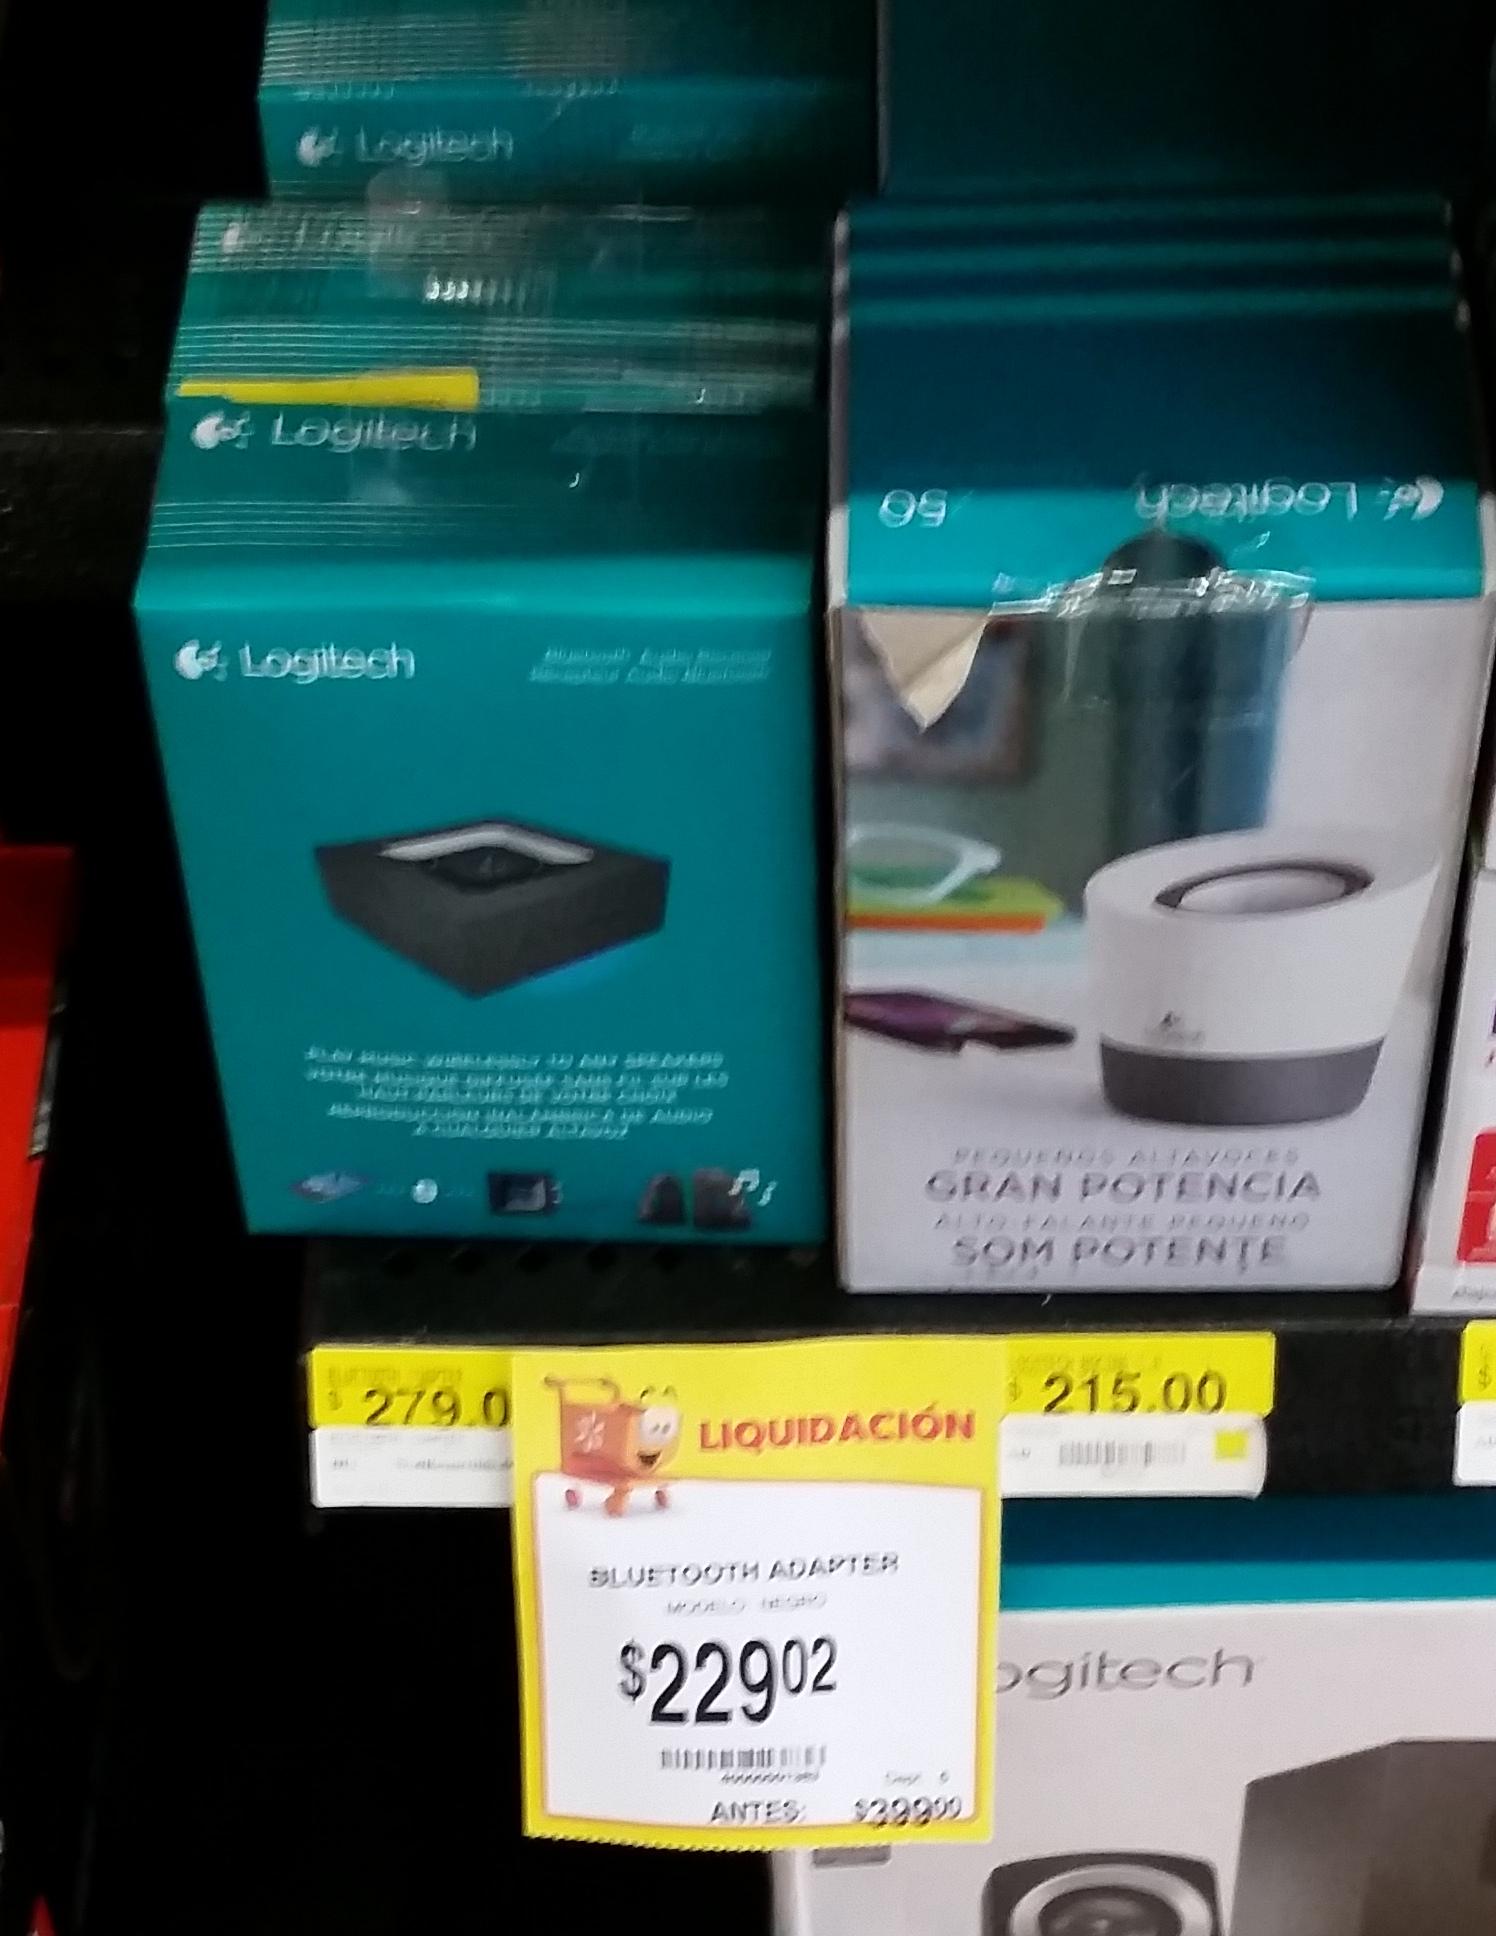 Walmart Deportiva Villahermosa: Adaptador Bluetooth Logitech a $229.02